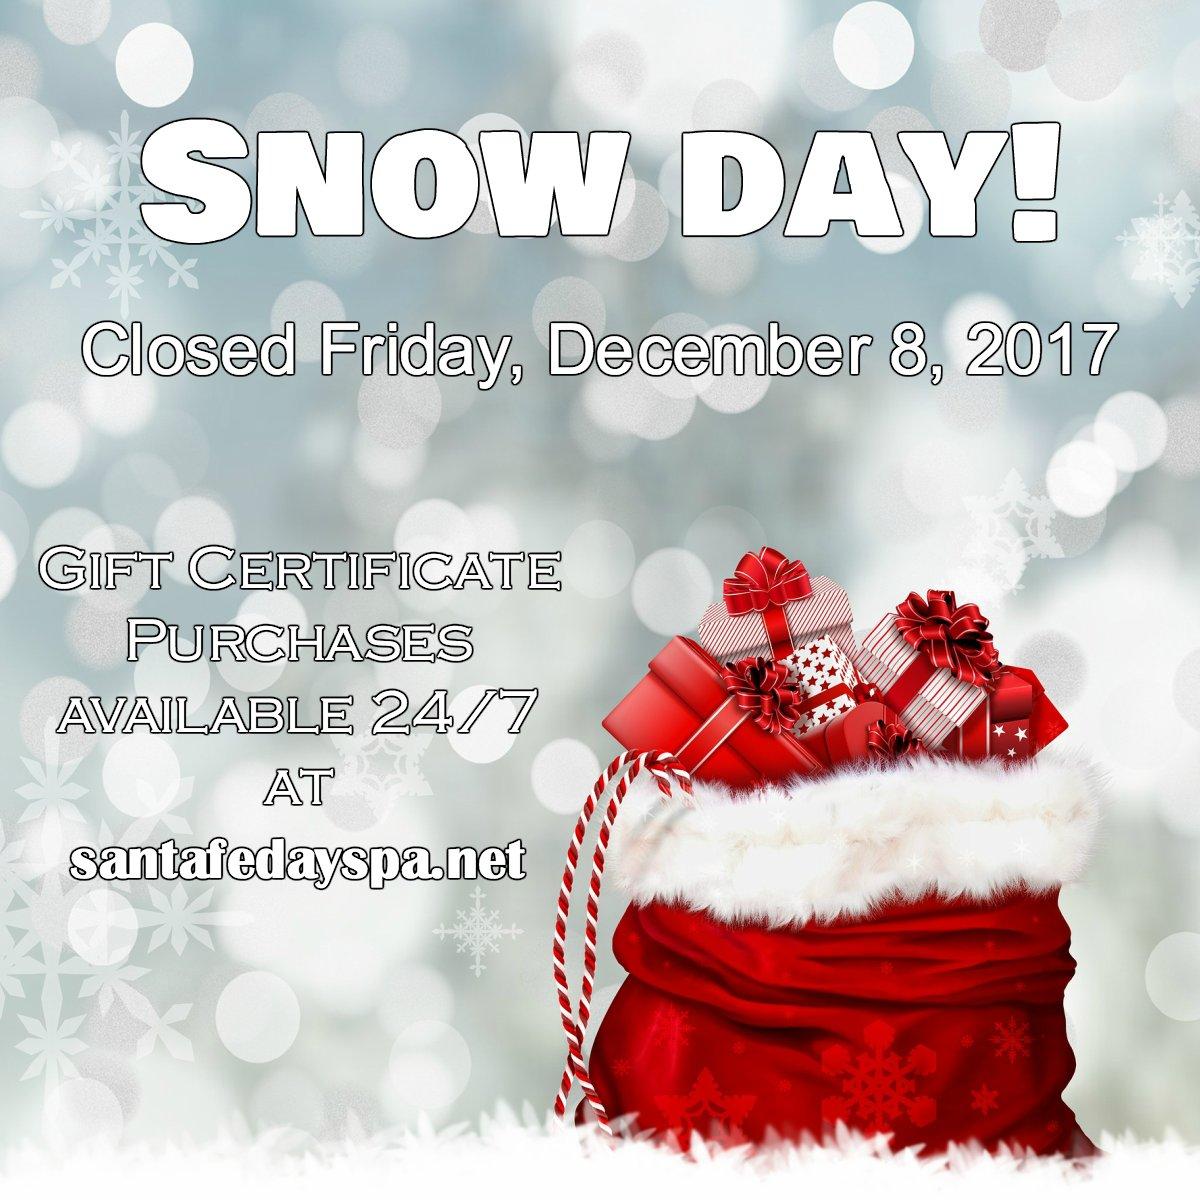 Santa Fe Day Spa on Twitter: \